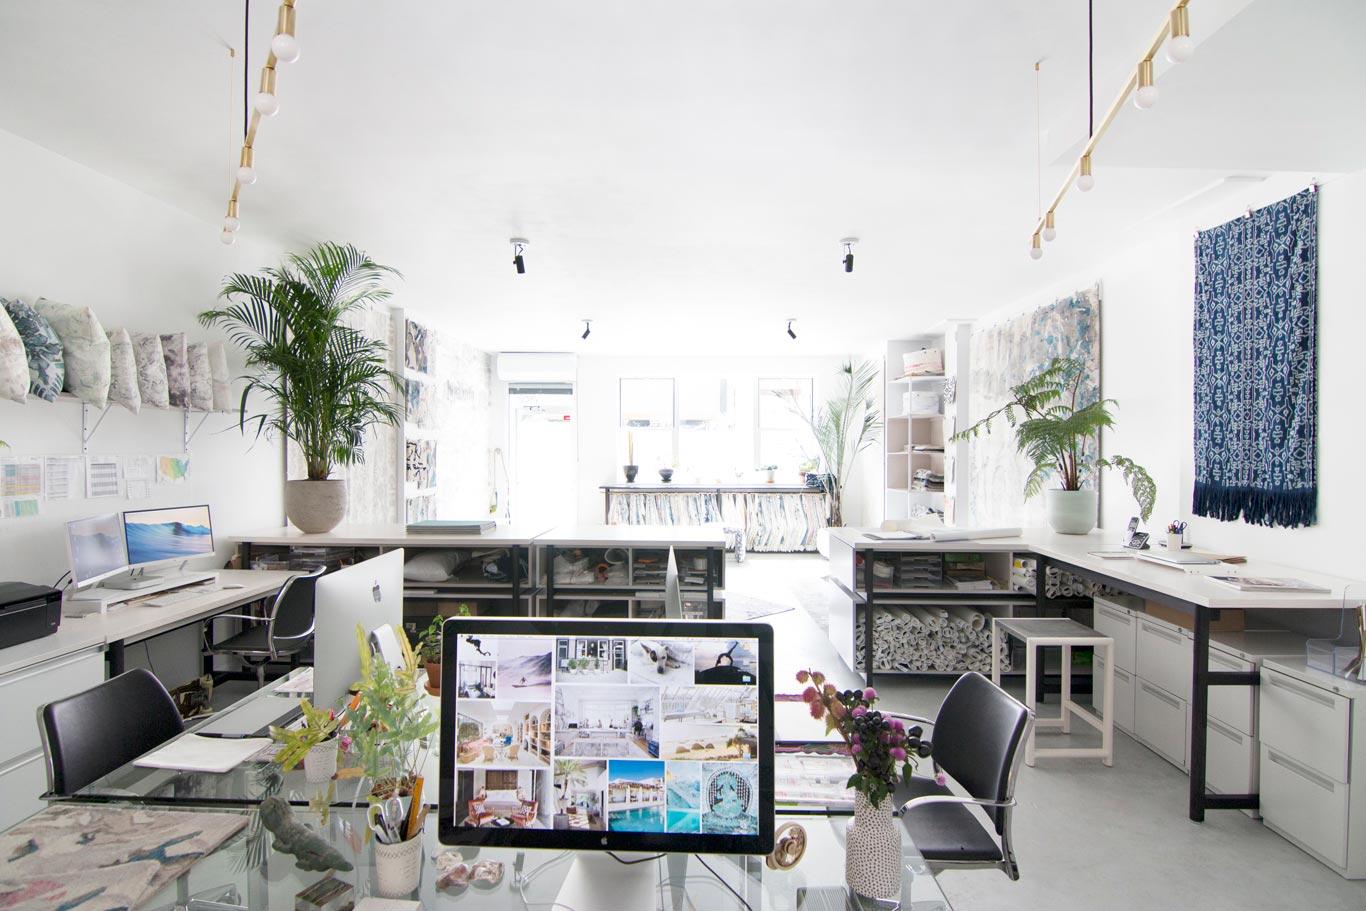 eskayel-williamsburg-showroom-5